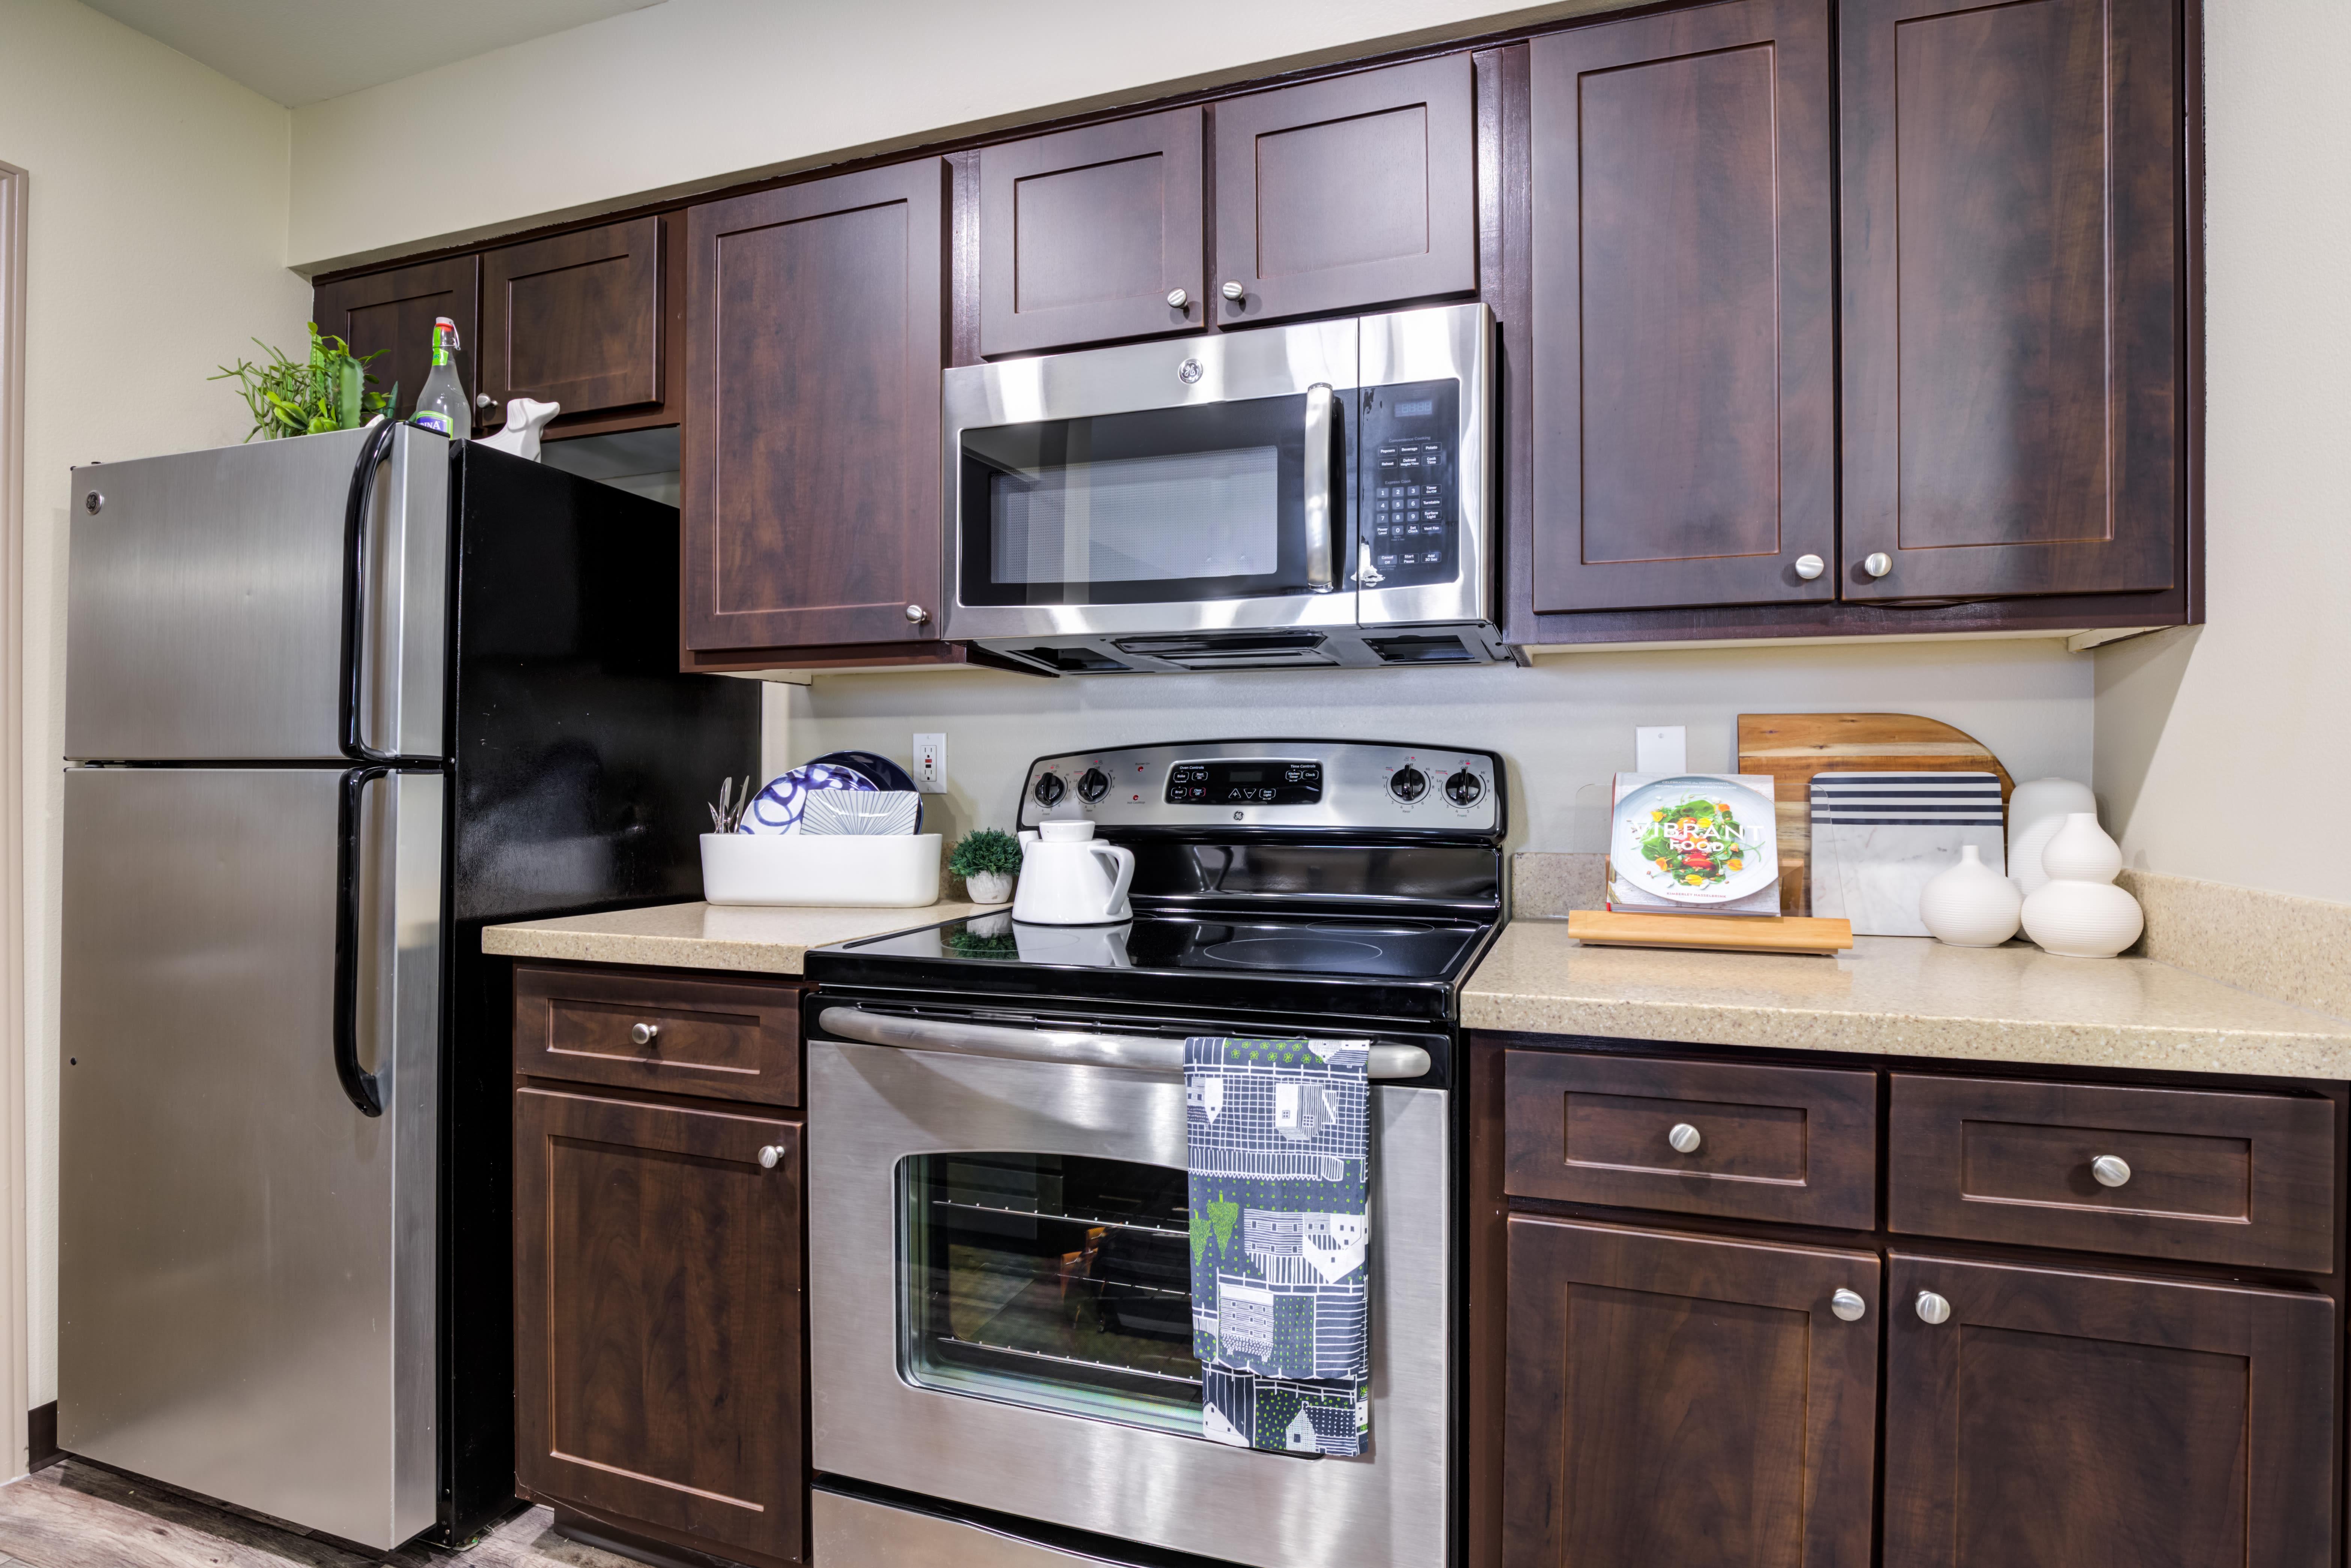 Our Beautiful Apartments in Sammamish, Washington showcase a Kitchen